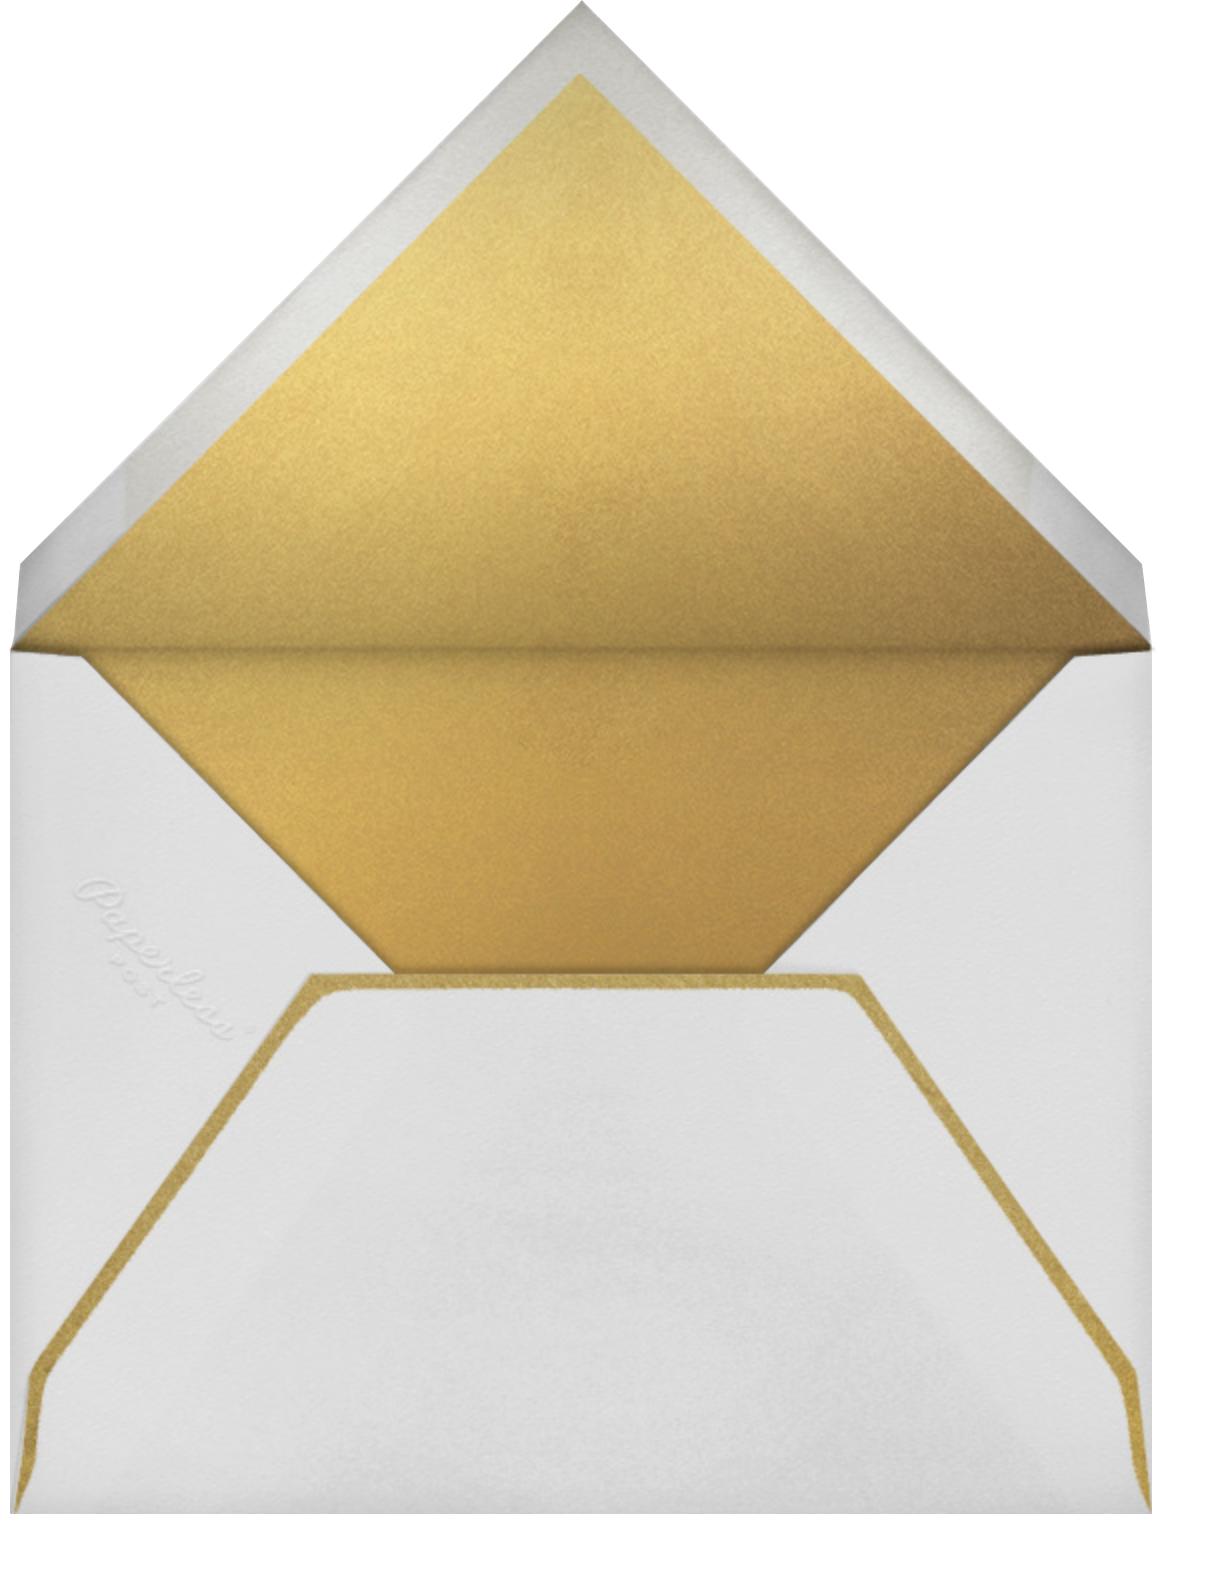 Niwas (Invitation) - Paperless Post - Printable invitations - envelope back